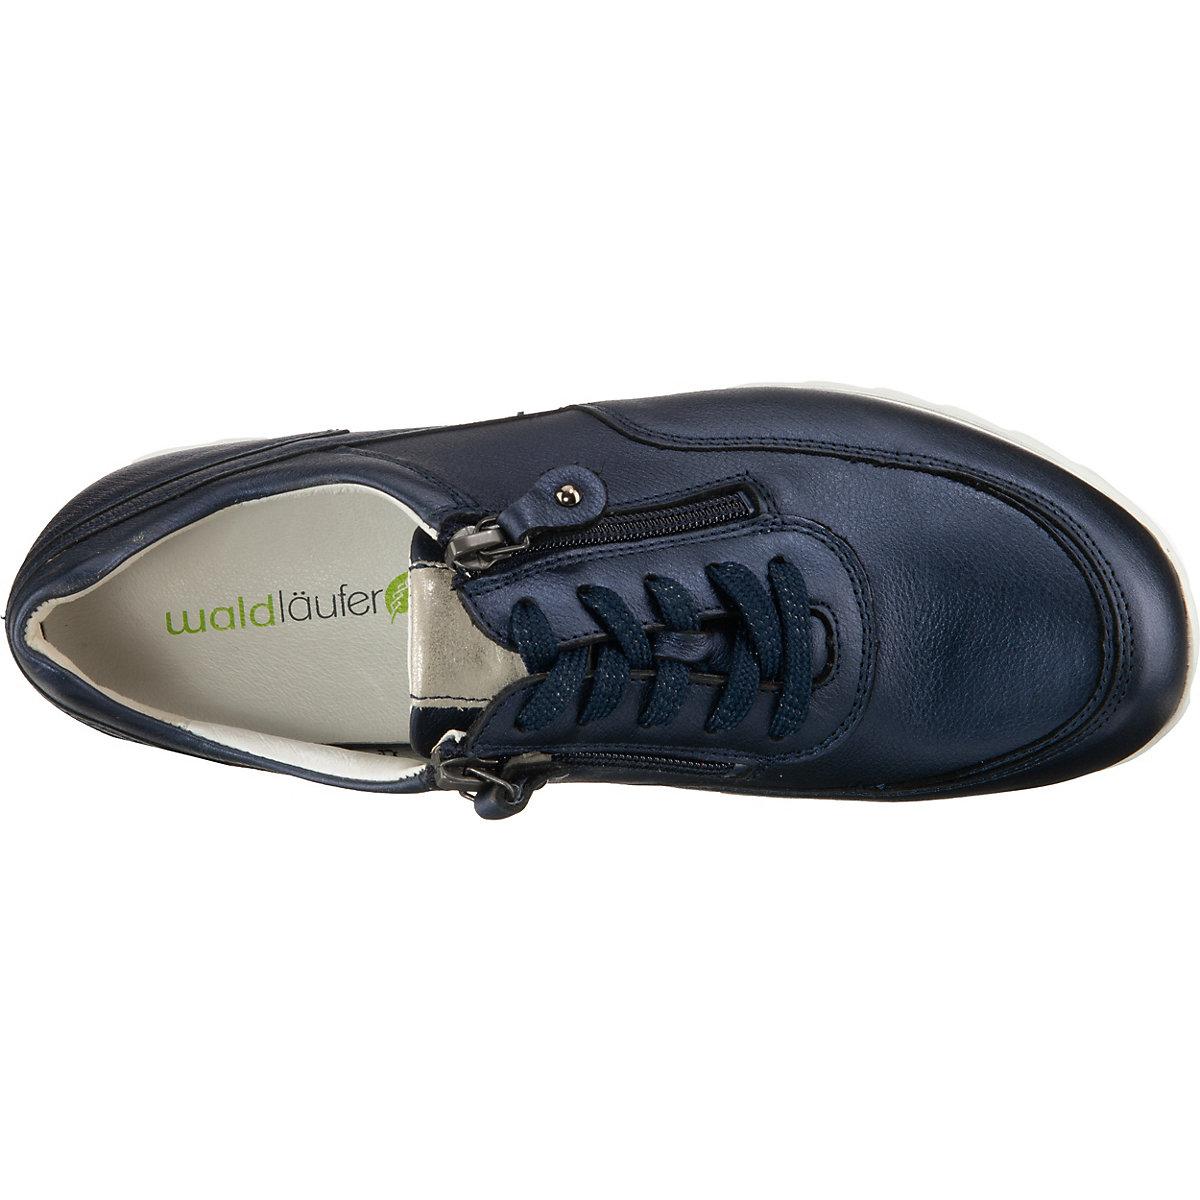 Waldläufer, Haiba Sneakers Low, Dunkelblau